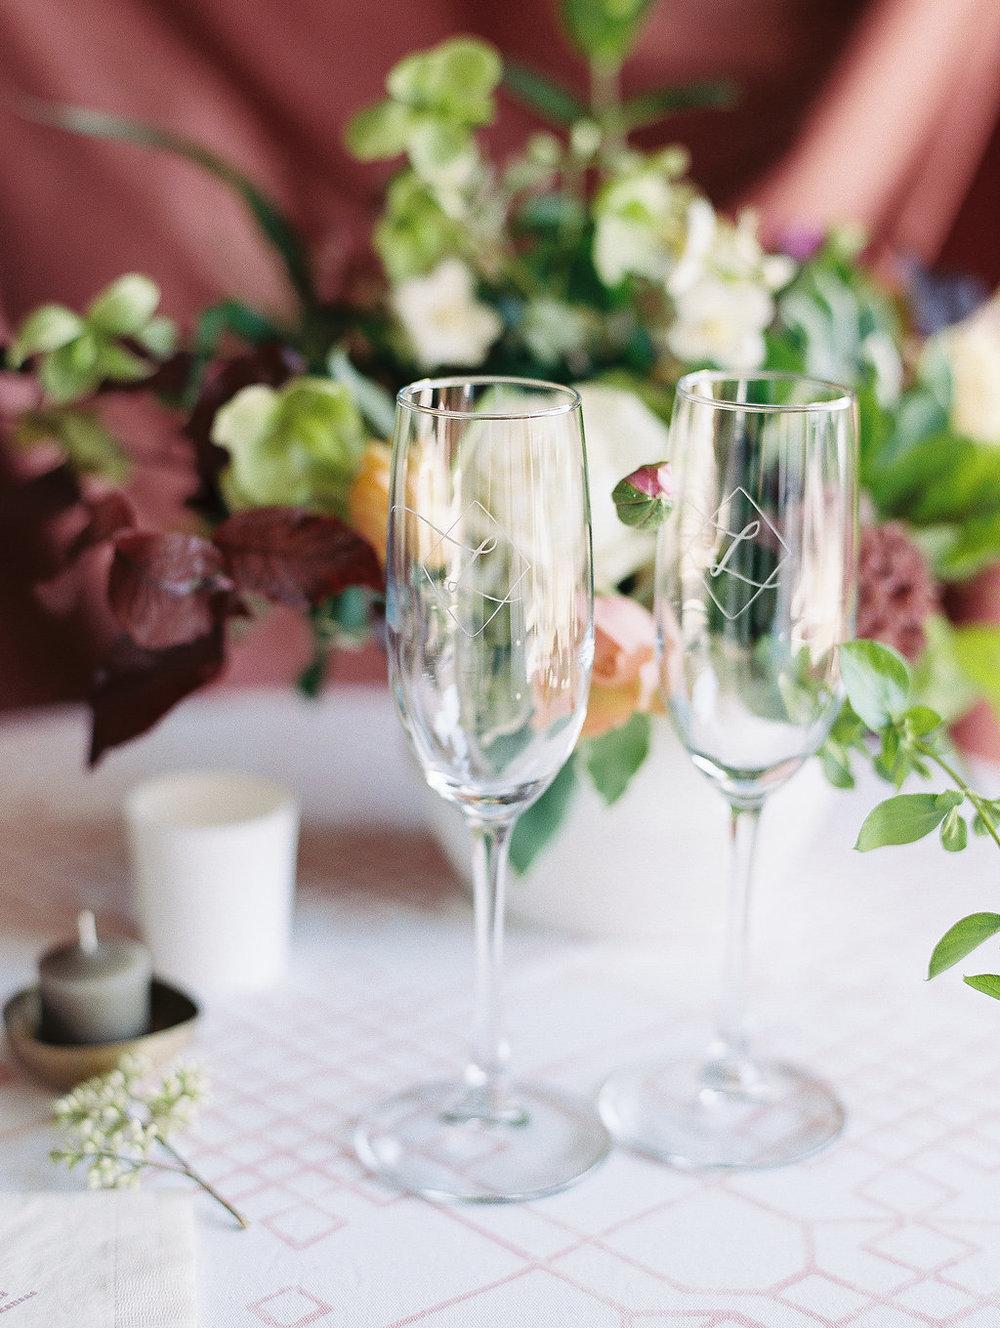 jessica-zimmerman-champagne-glasses-custom-wedding.jpg